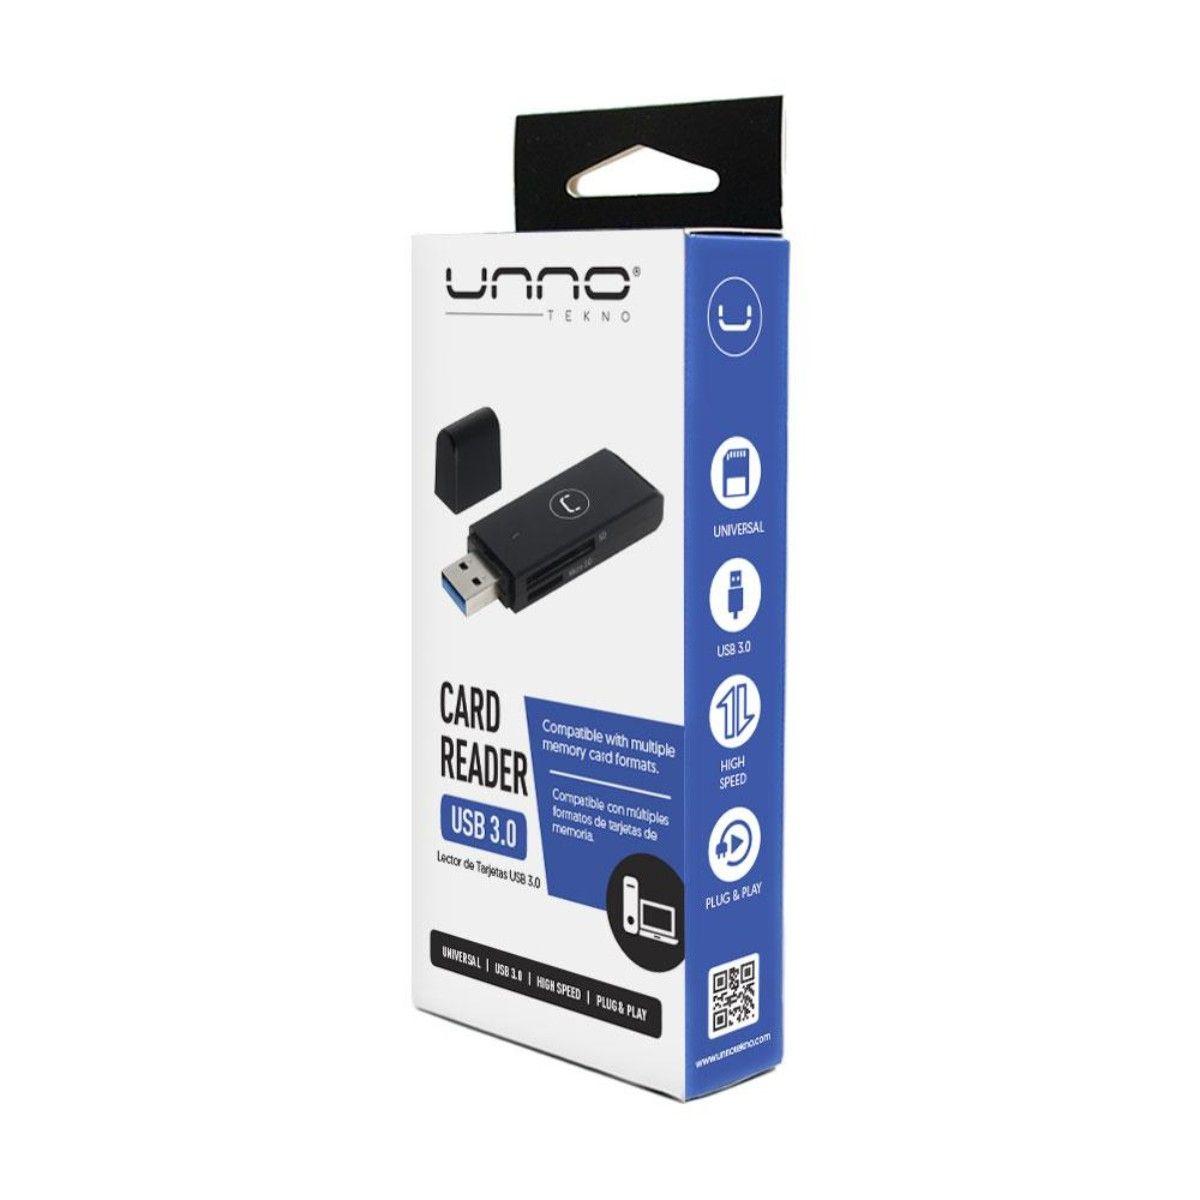 CR1004BK Card Reader USB 3.0 2 1000x1000 1